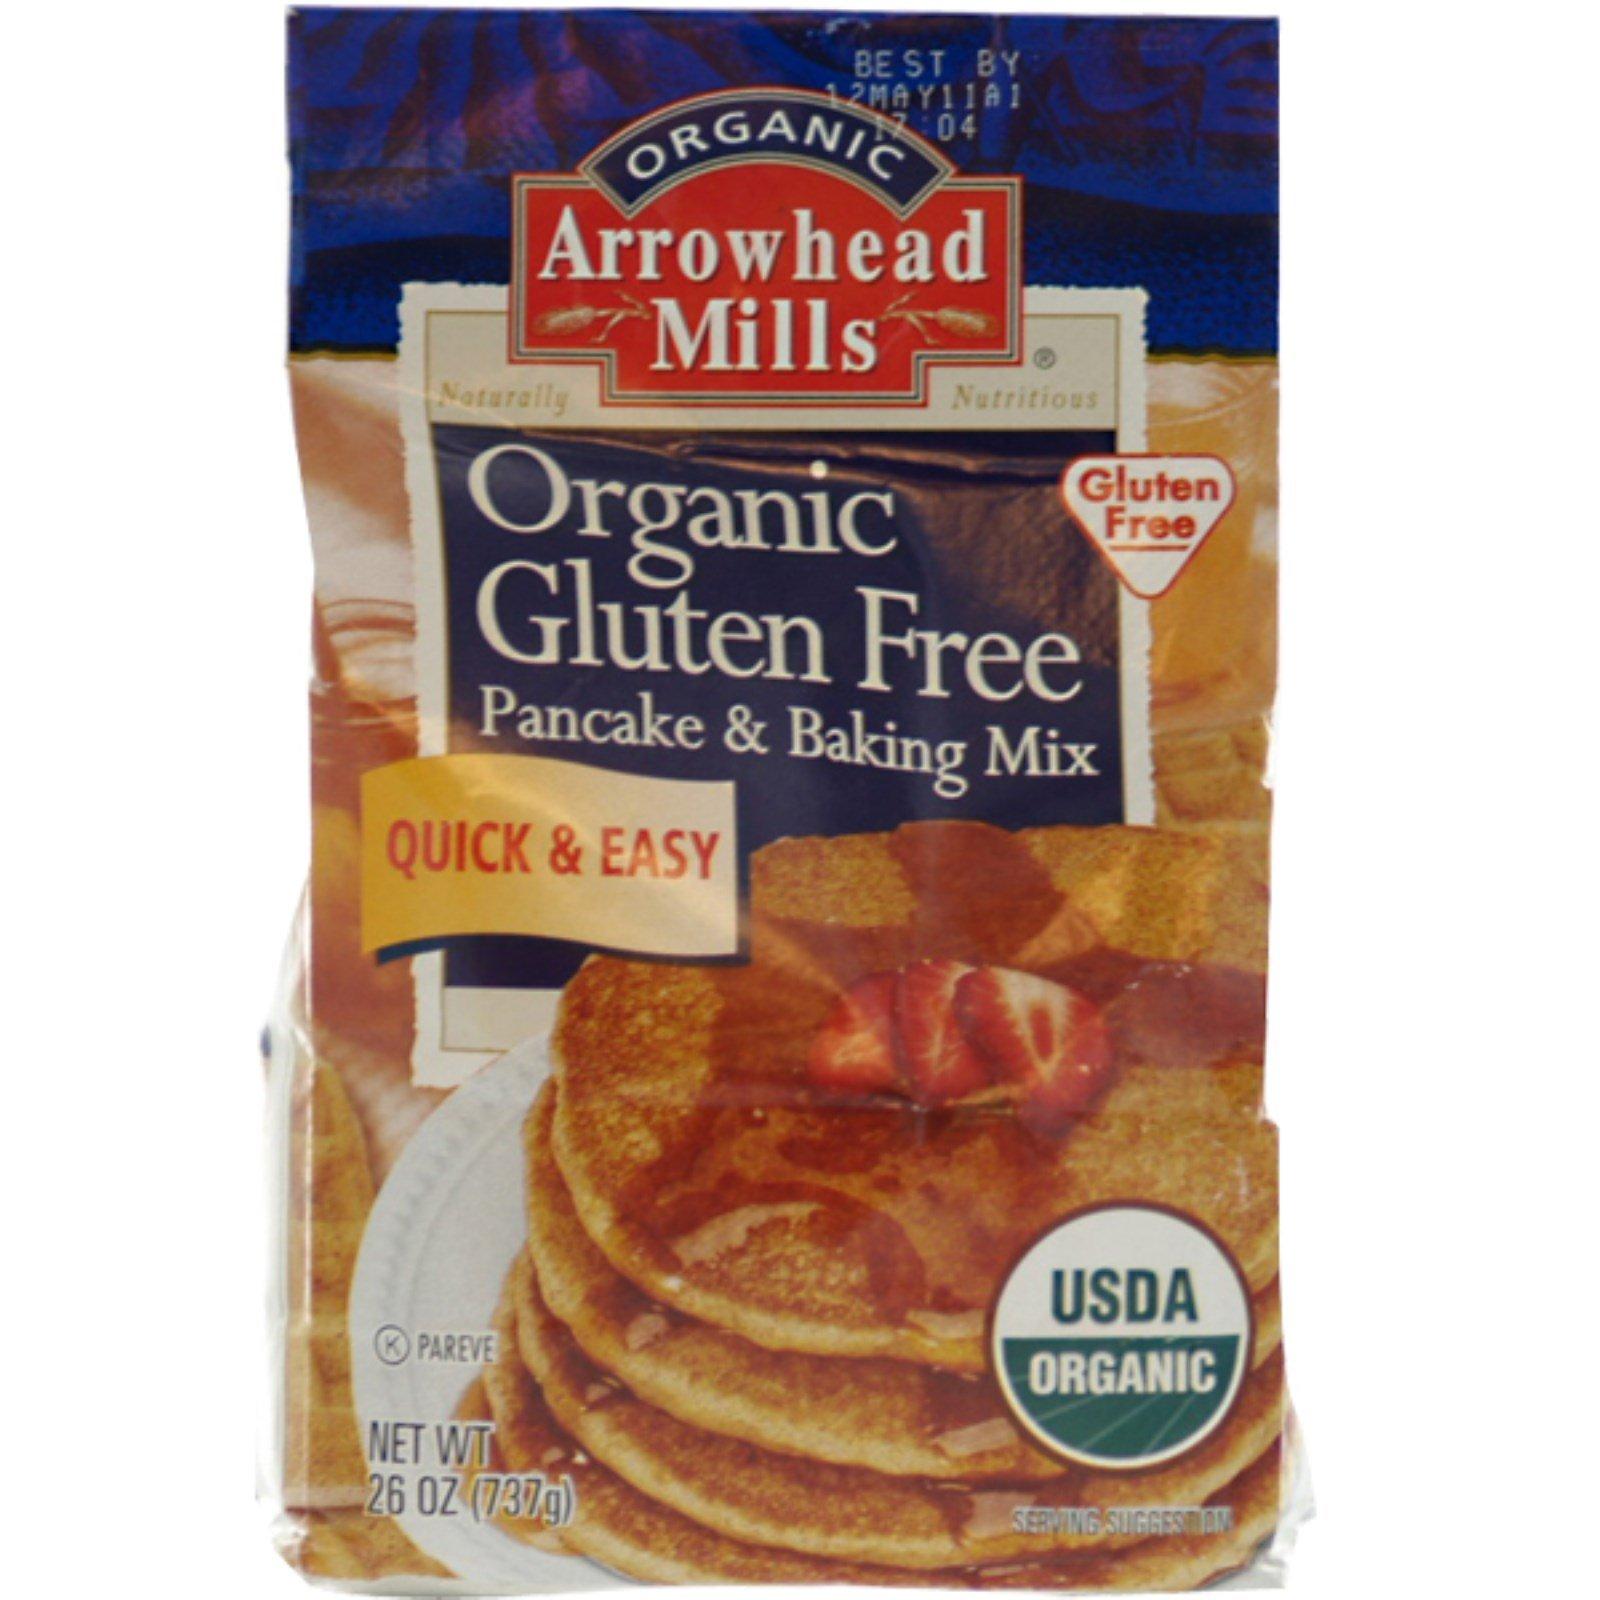 Arrowhead Mills, Organic Gluten Free Pancake & Baking Mix, 26 oz (737 g) - 2pcs